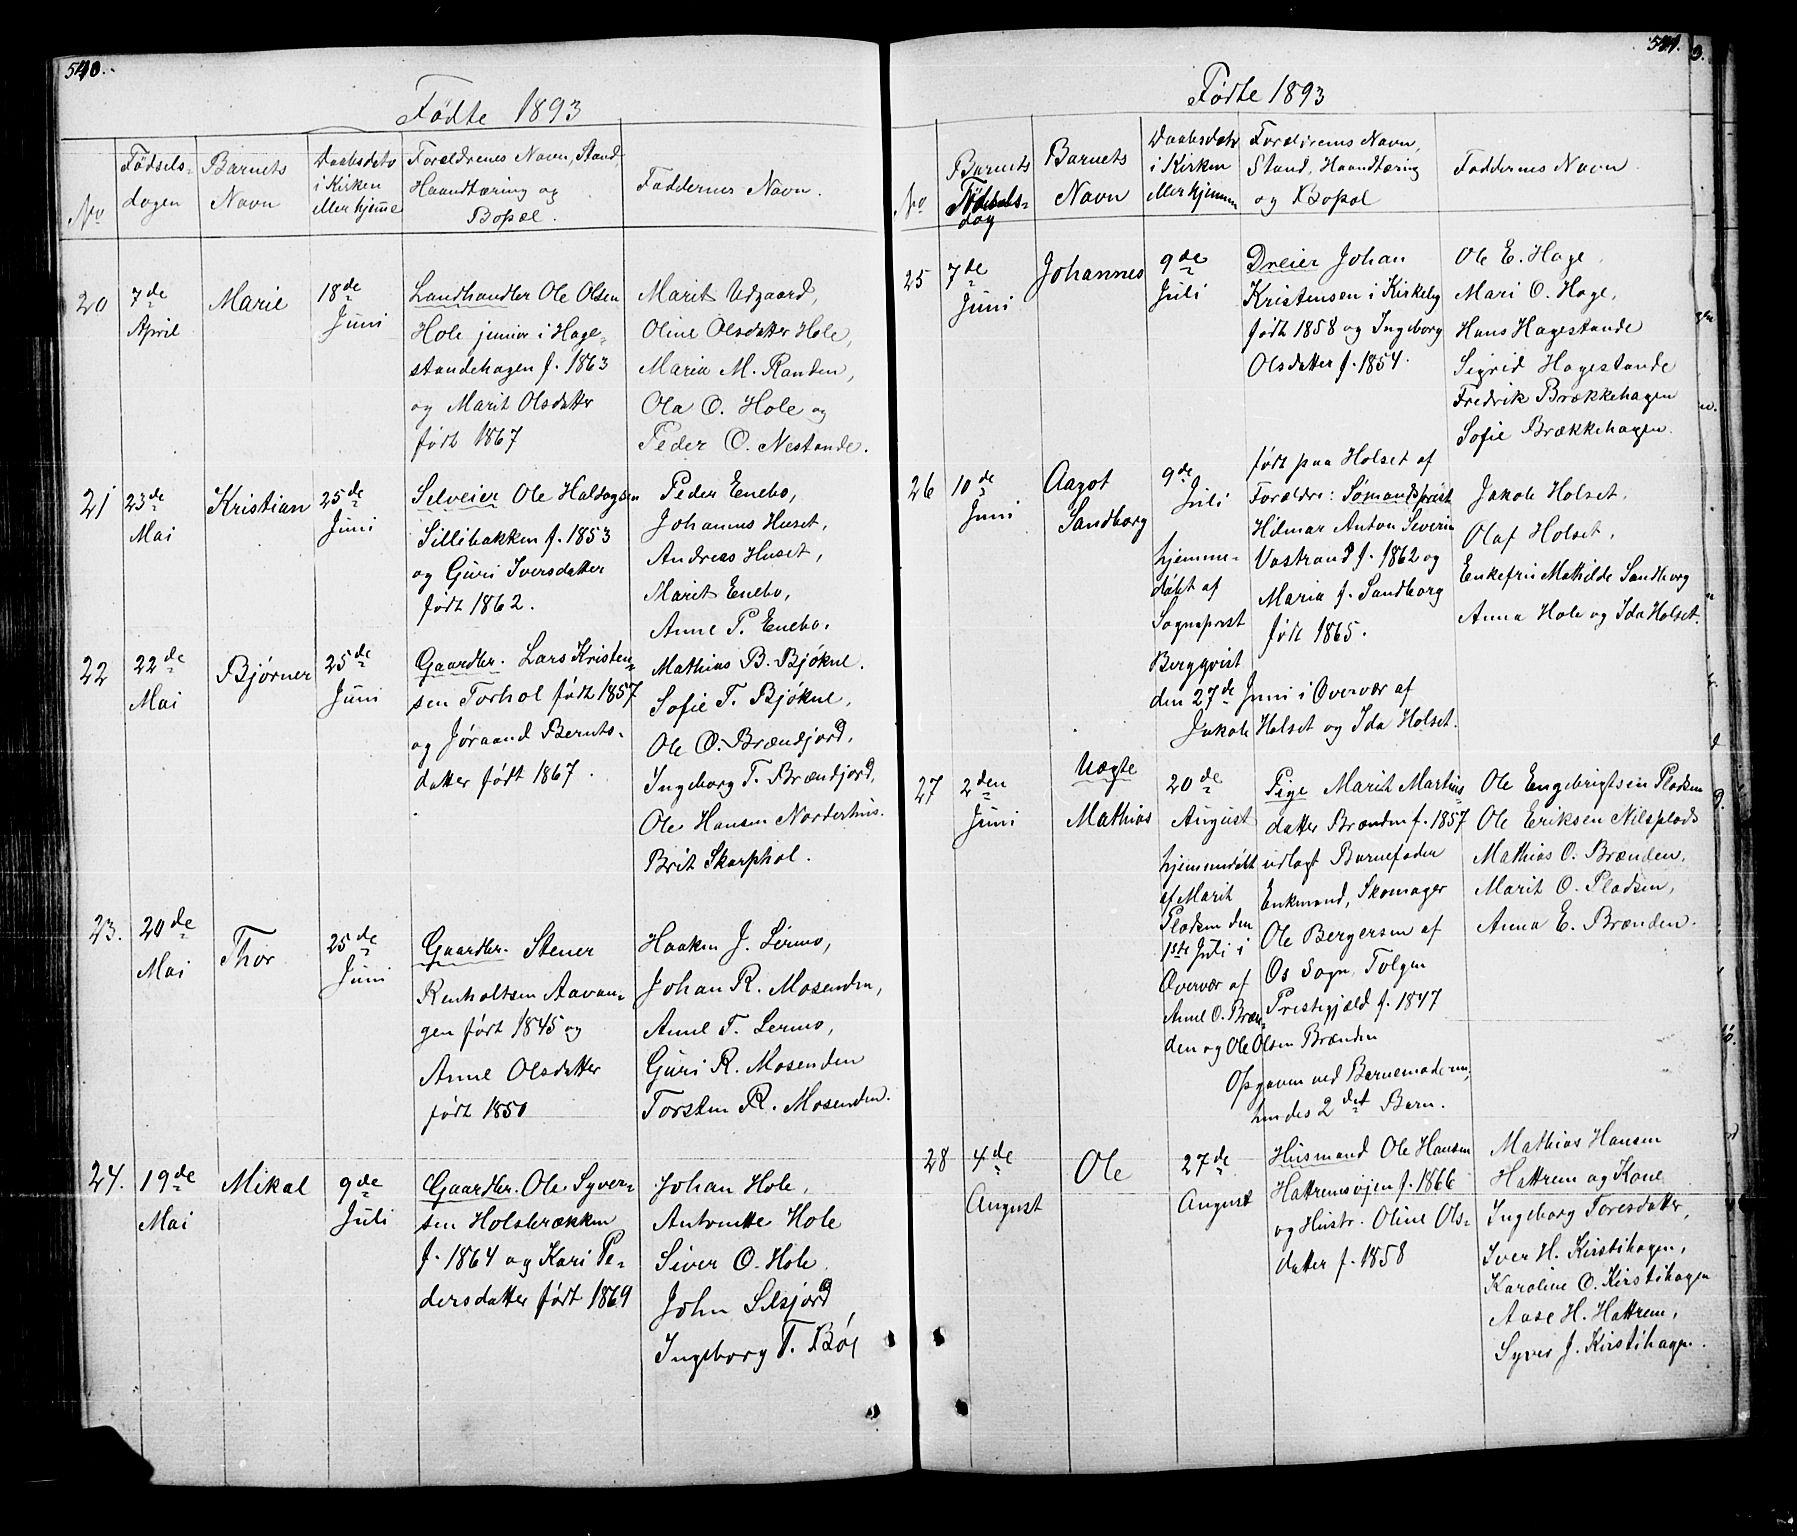 SAH, Lesja prestekontor, Klokkerbok nr. 5, 1850-1894, s. 540-541